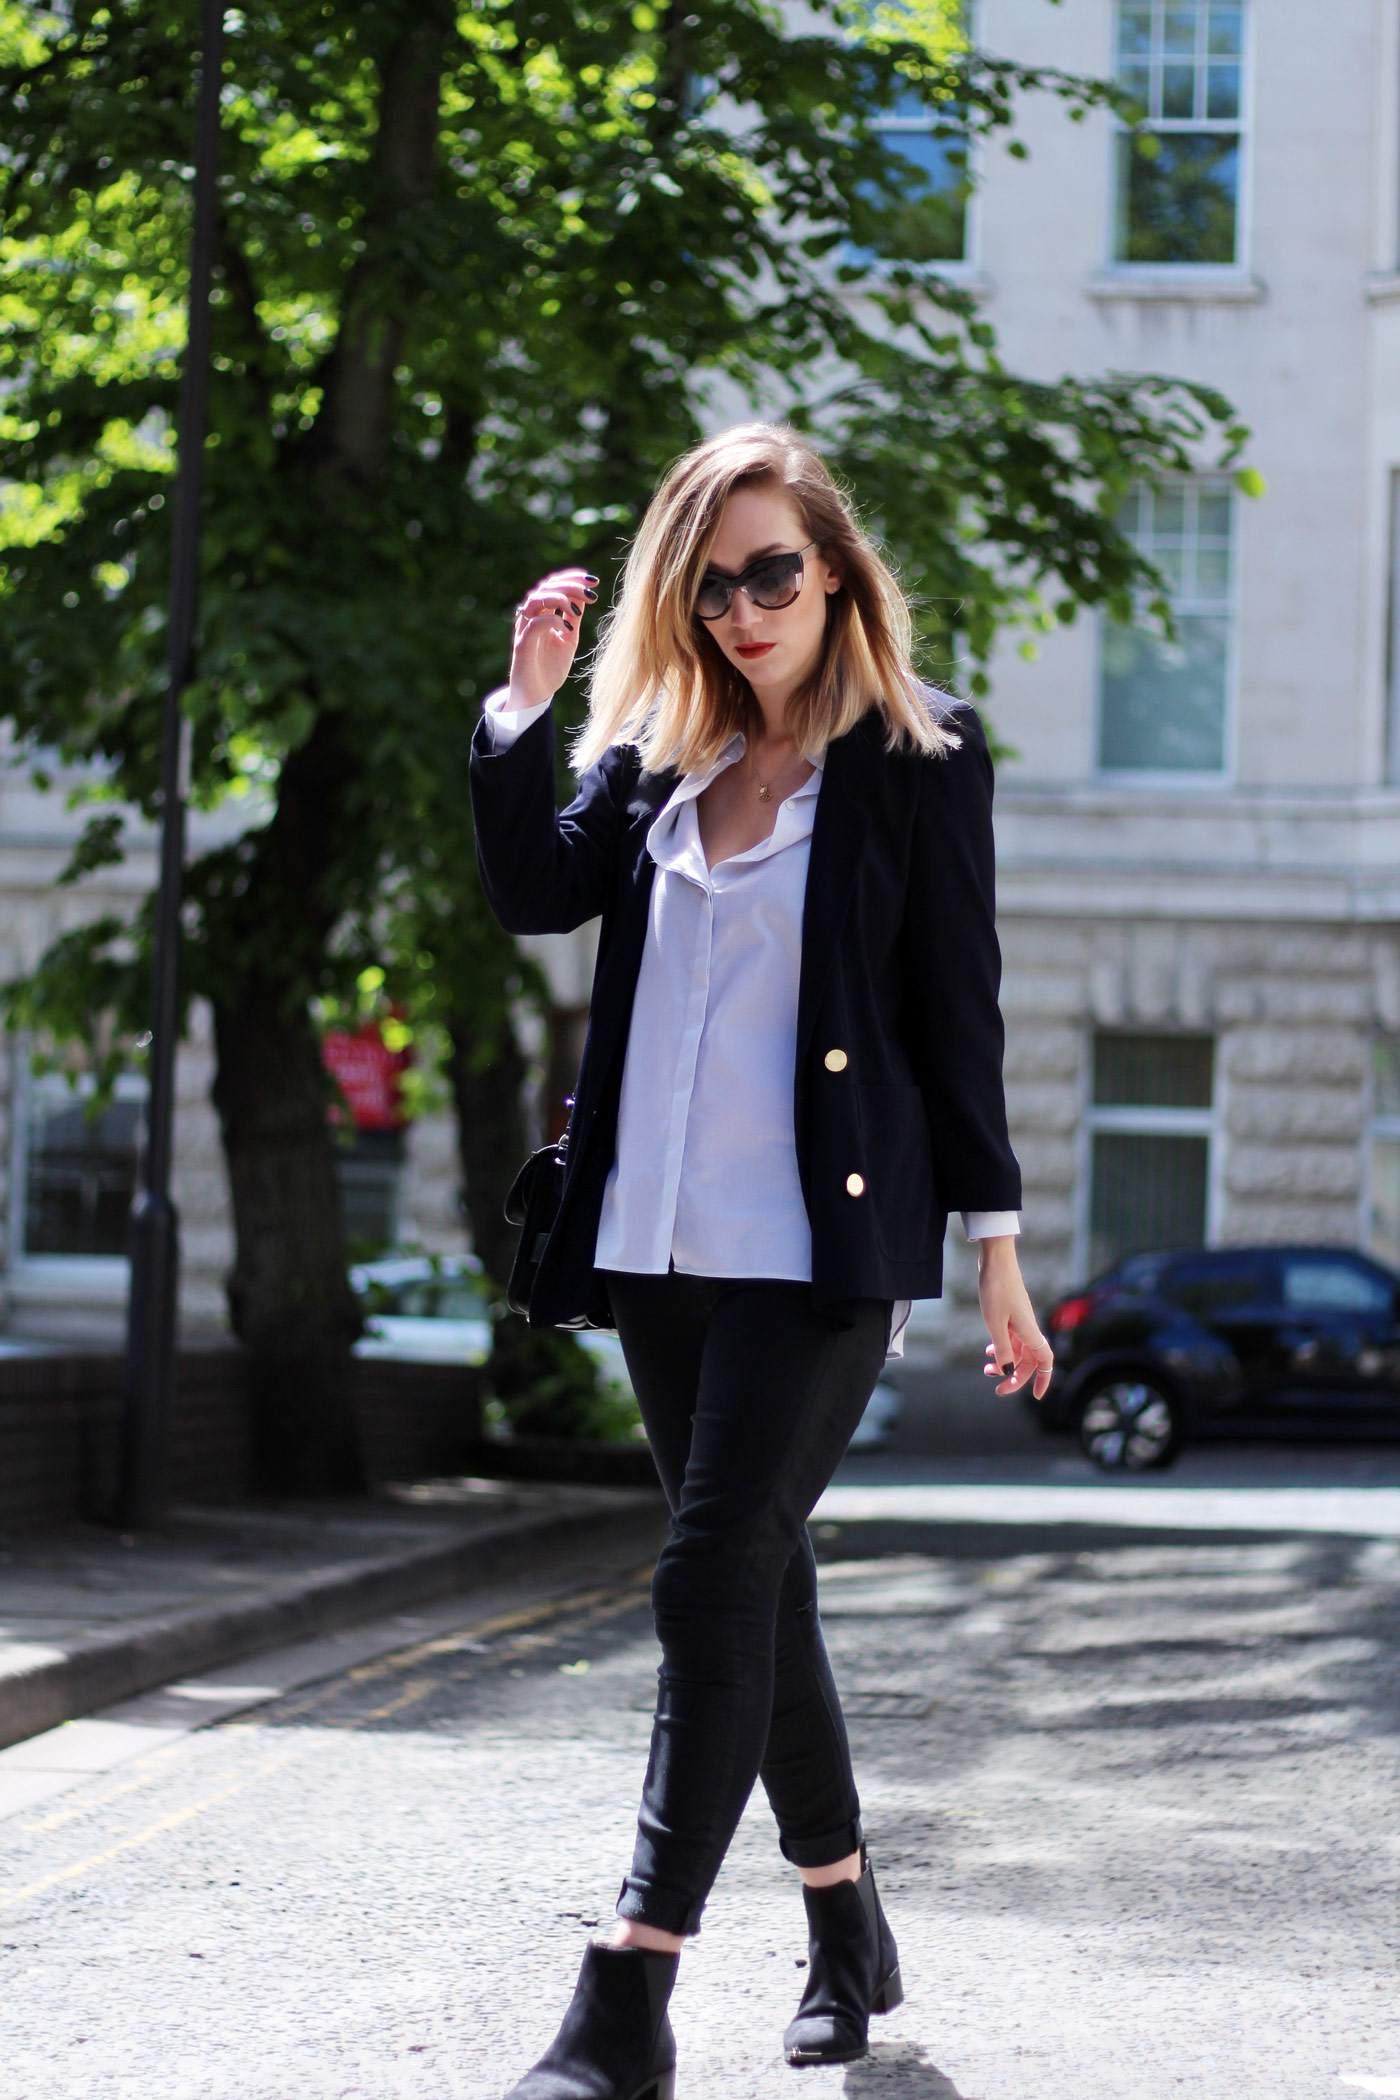 acne-jensen-boots-M&S-alexa-chung-ada-blazer-outfit-6